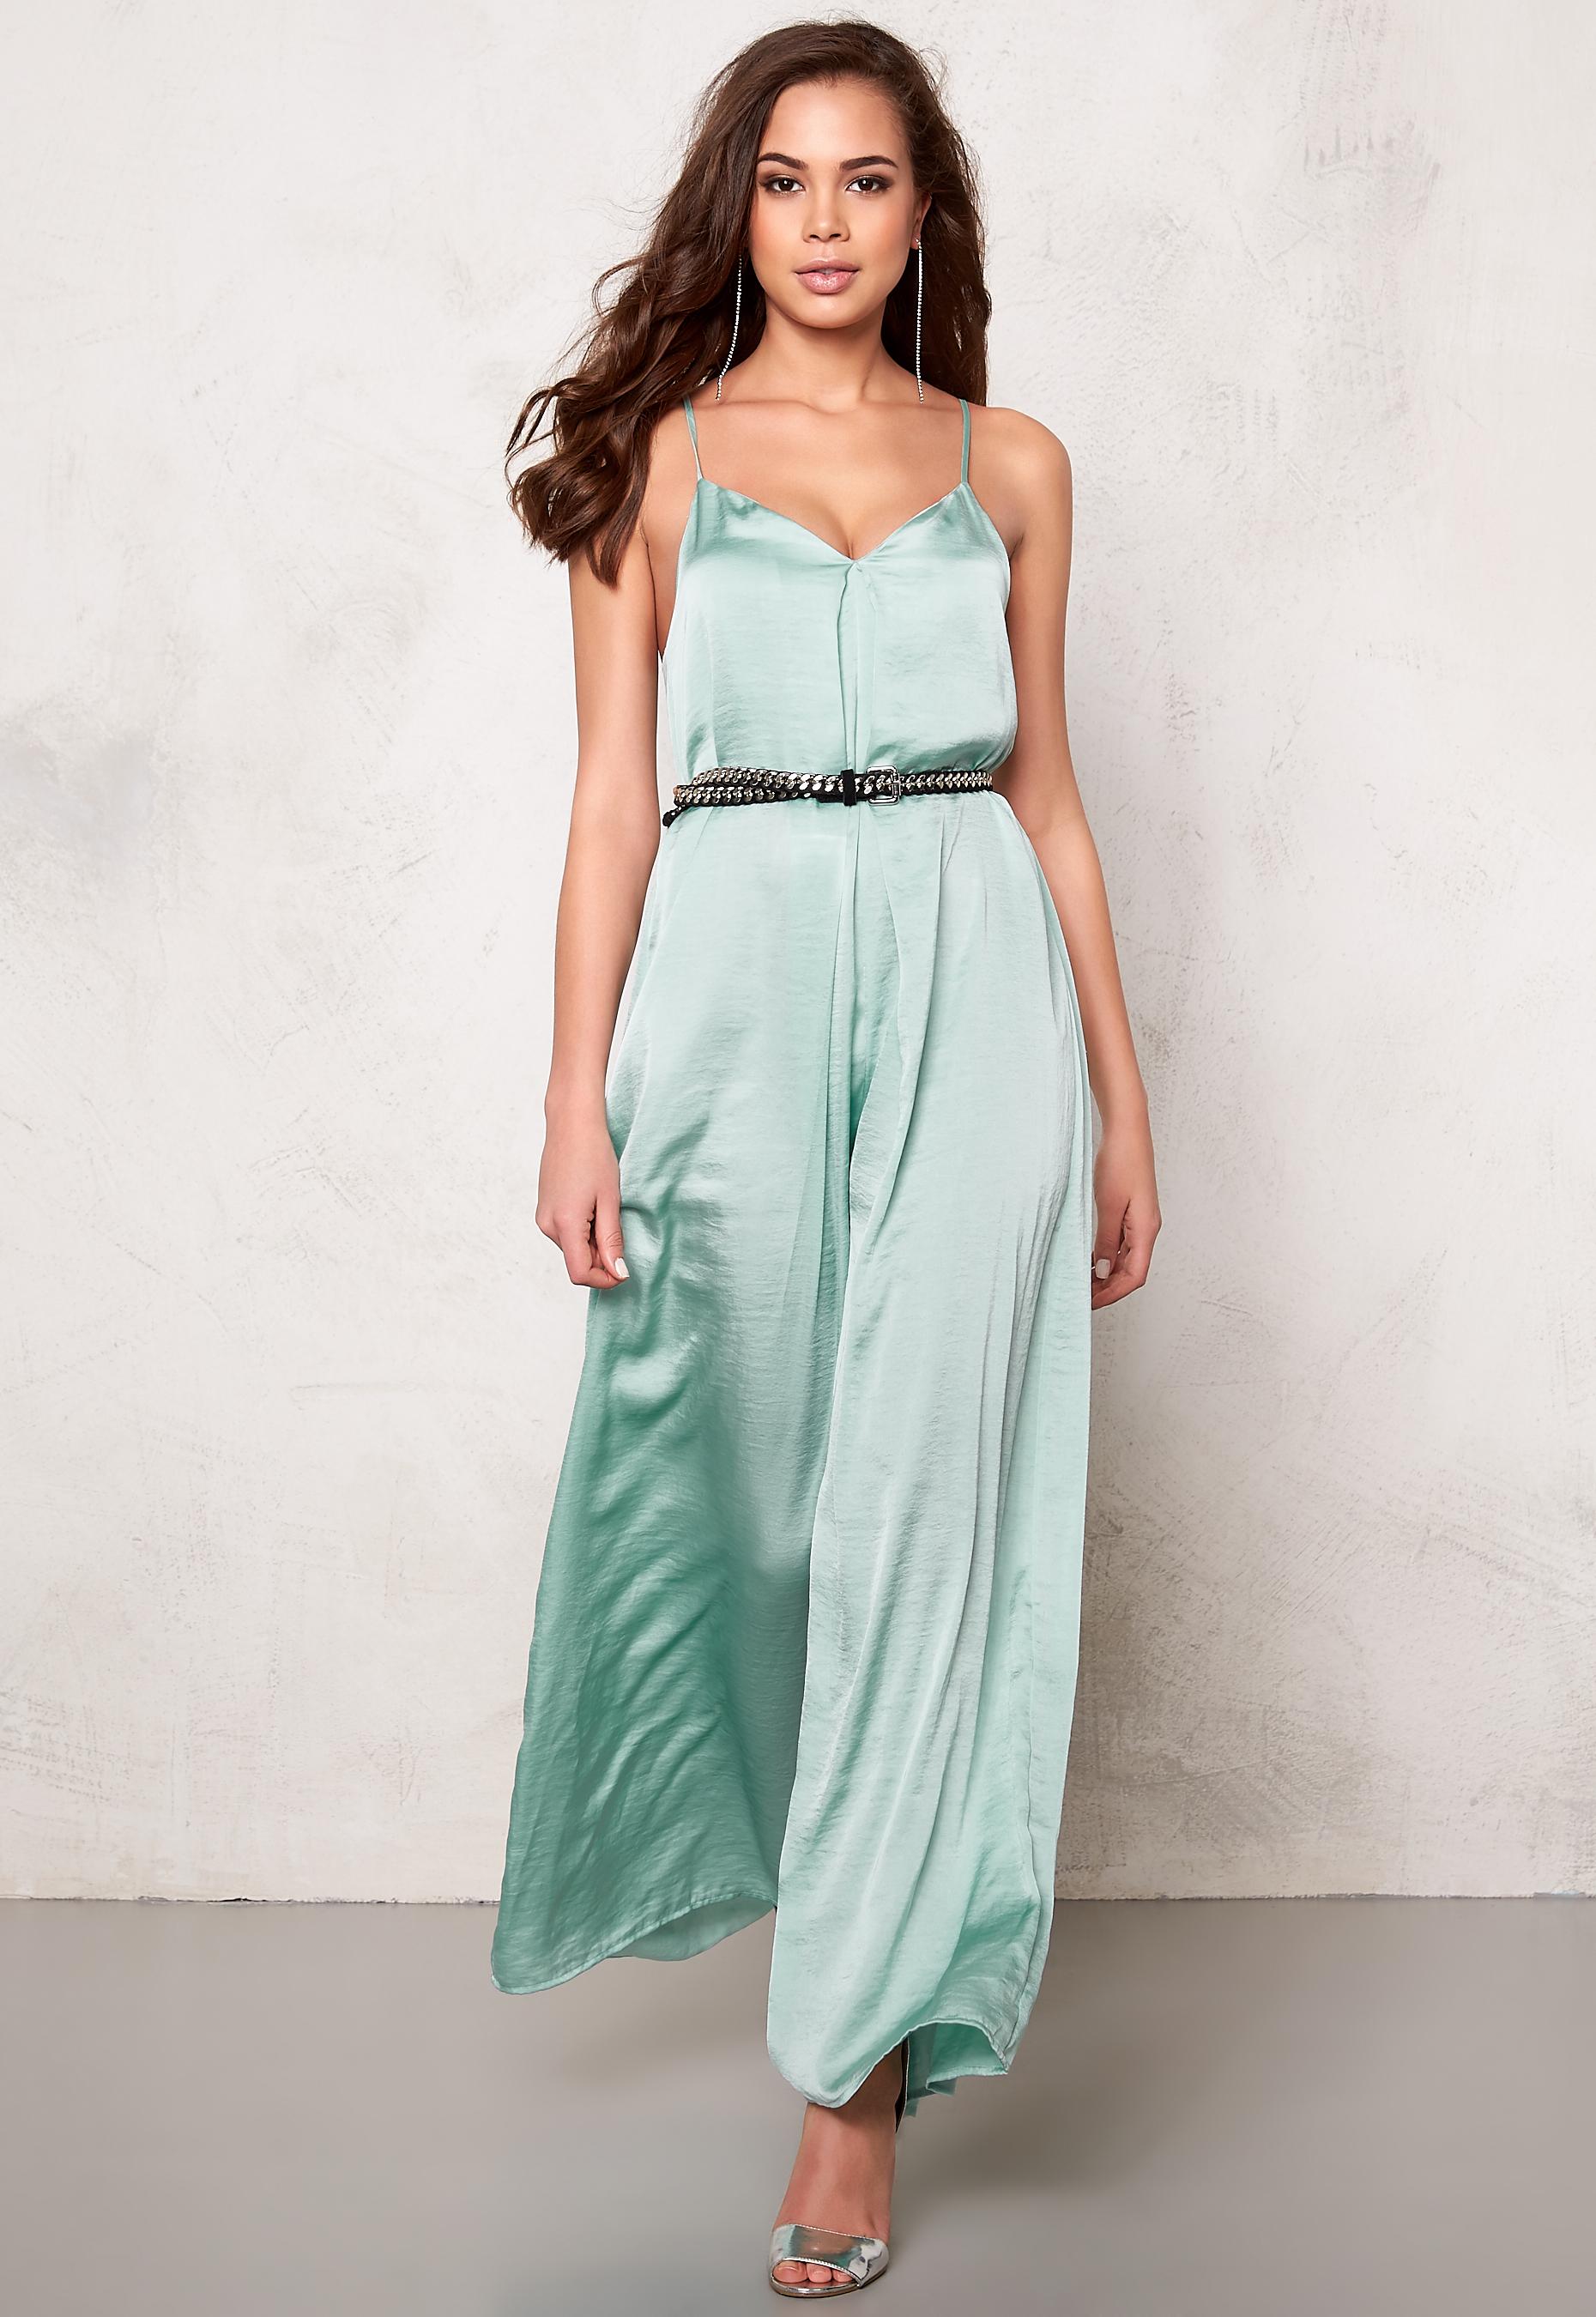 Beautiful Wedding Guest Short Dresses Crest - All Wedding Dresses ...